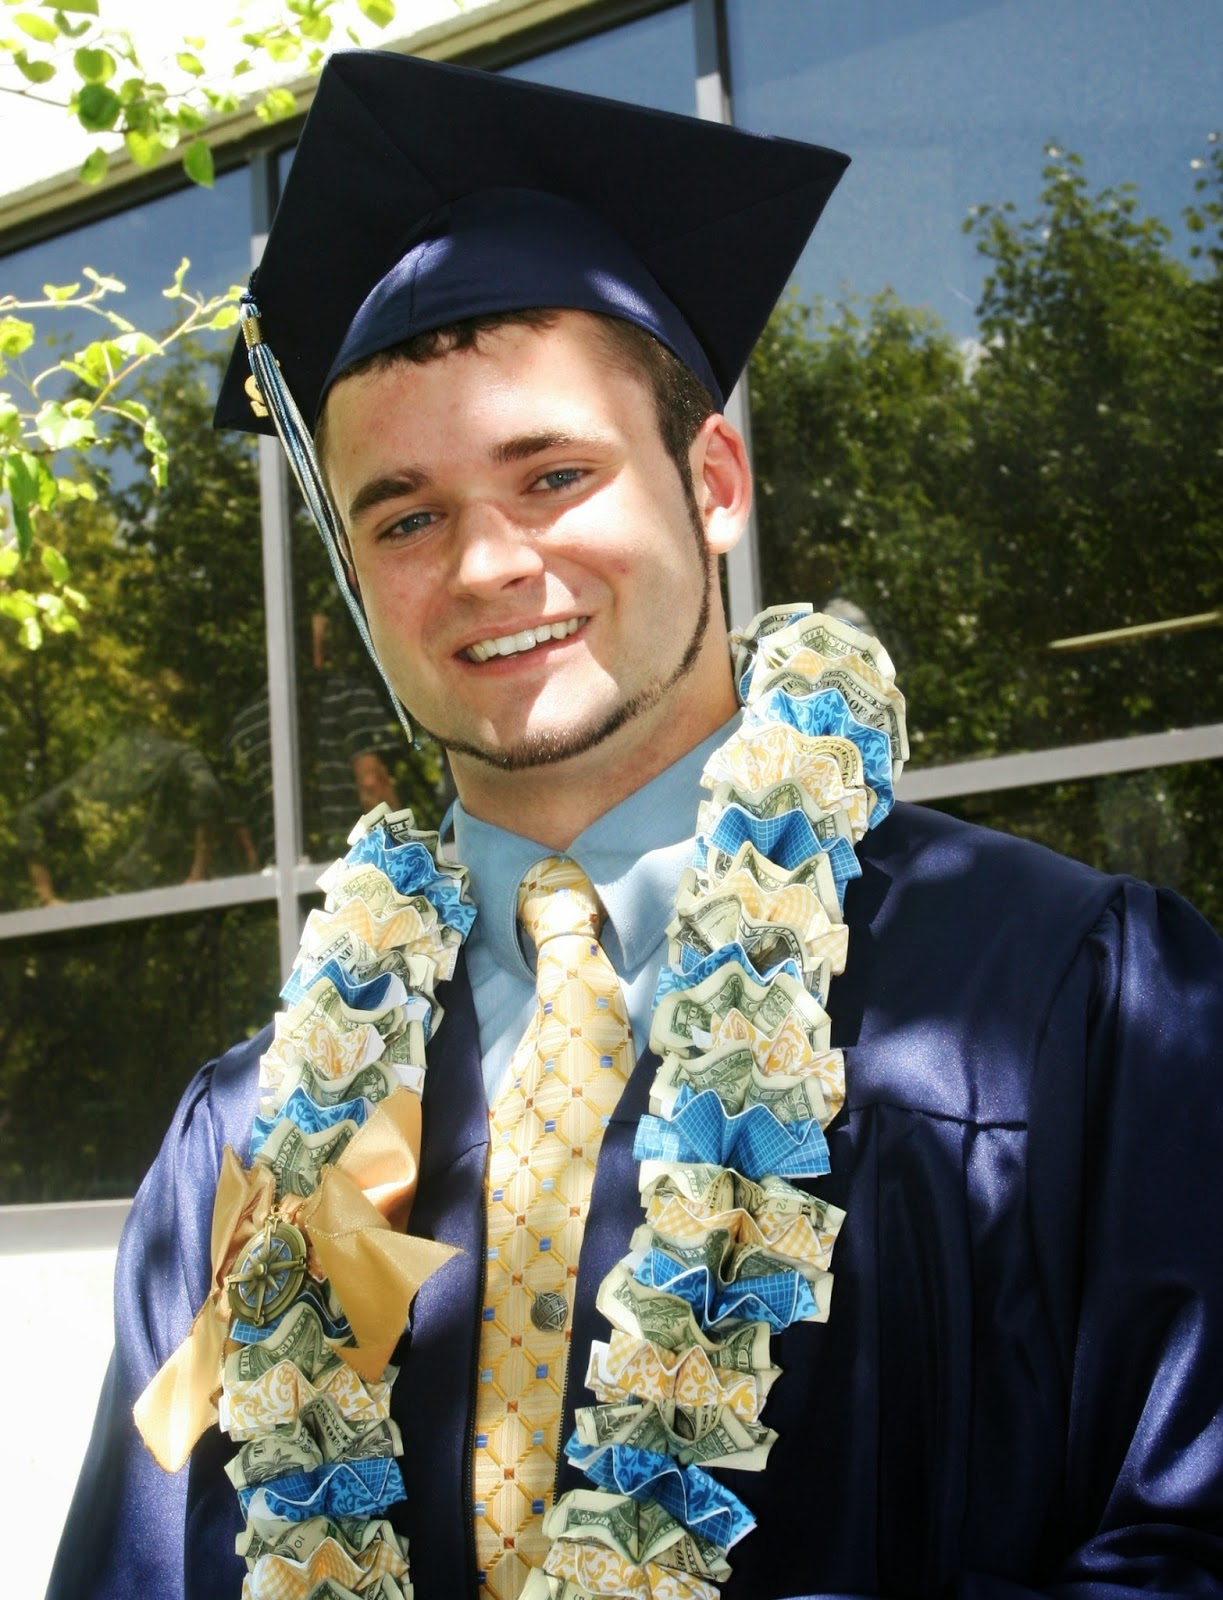 Dollar Bill Graduation Cap | 1600x1223